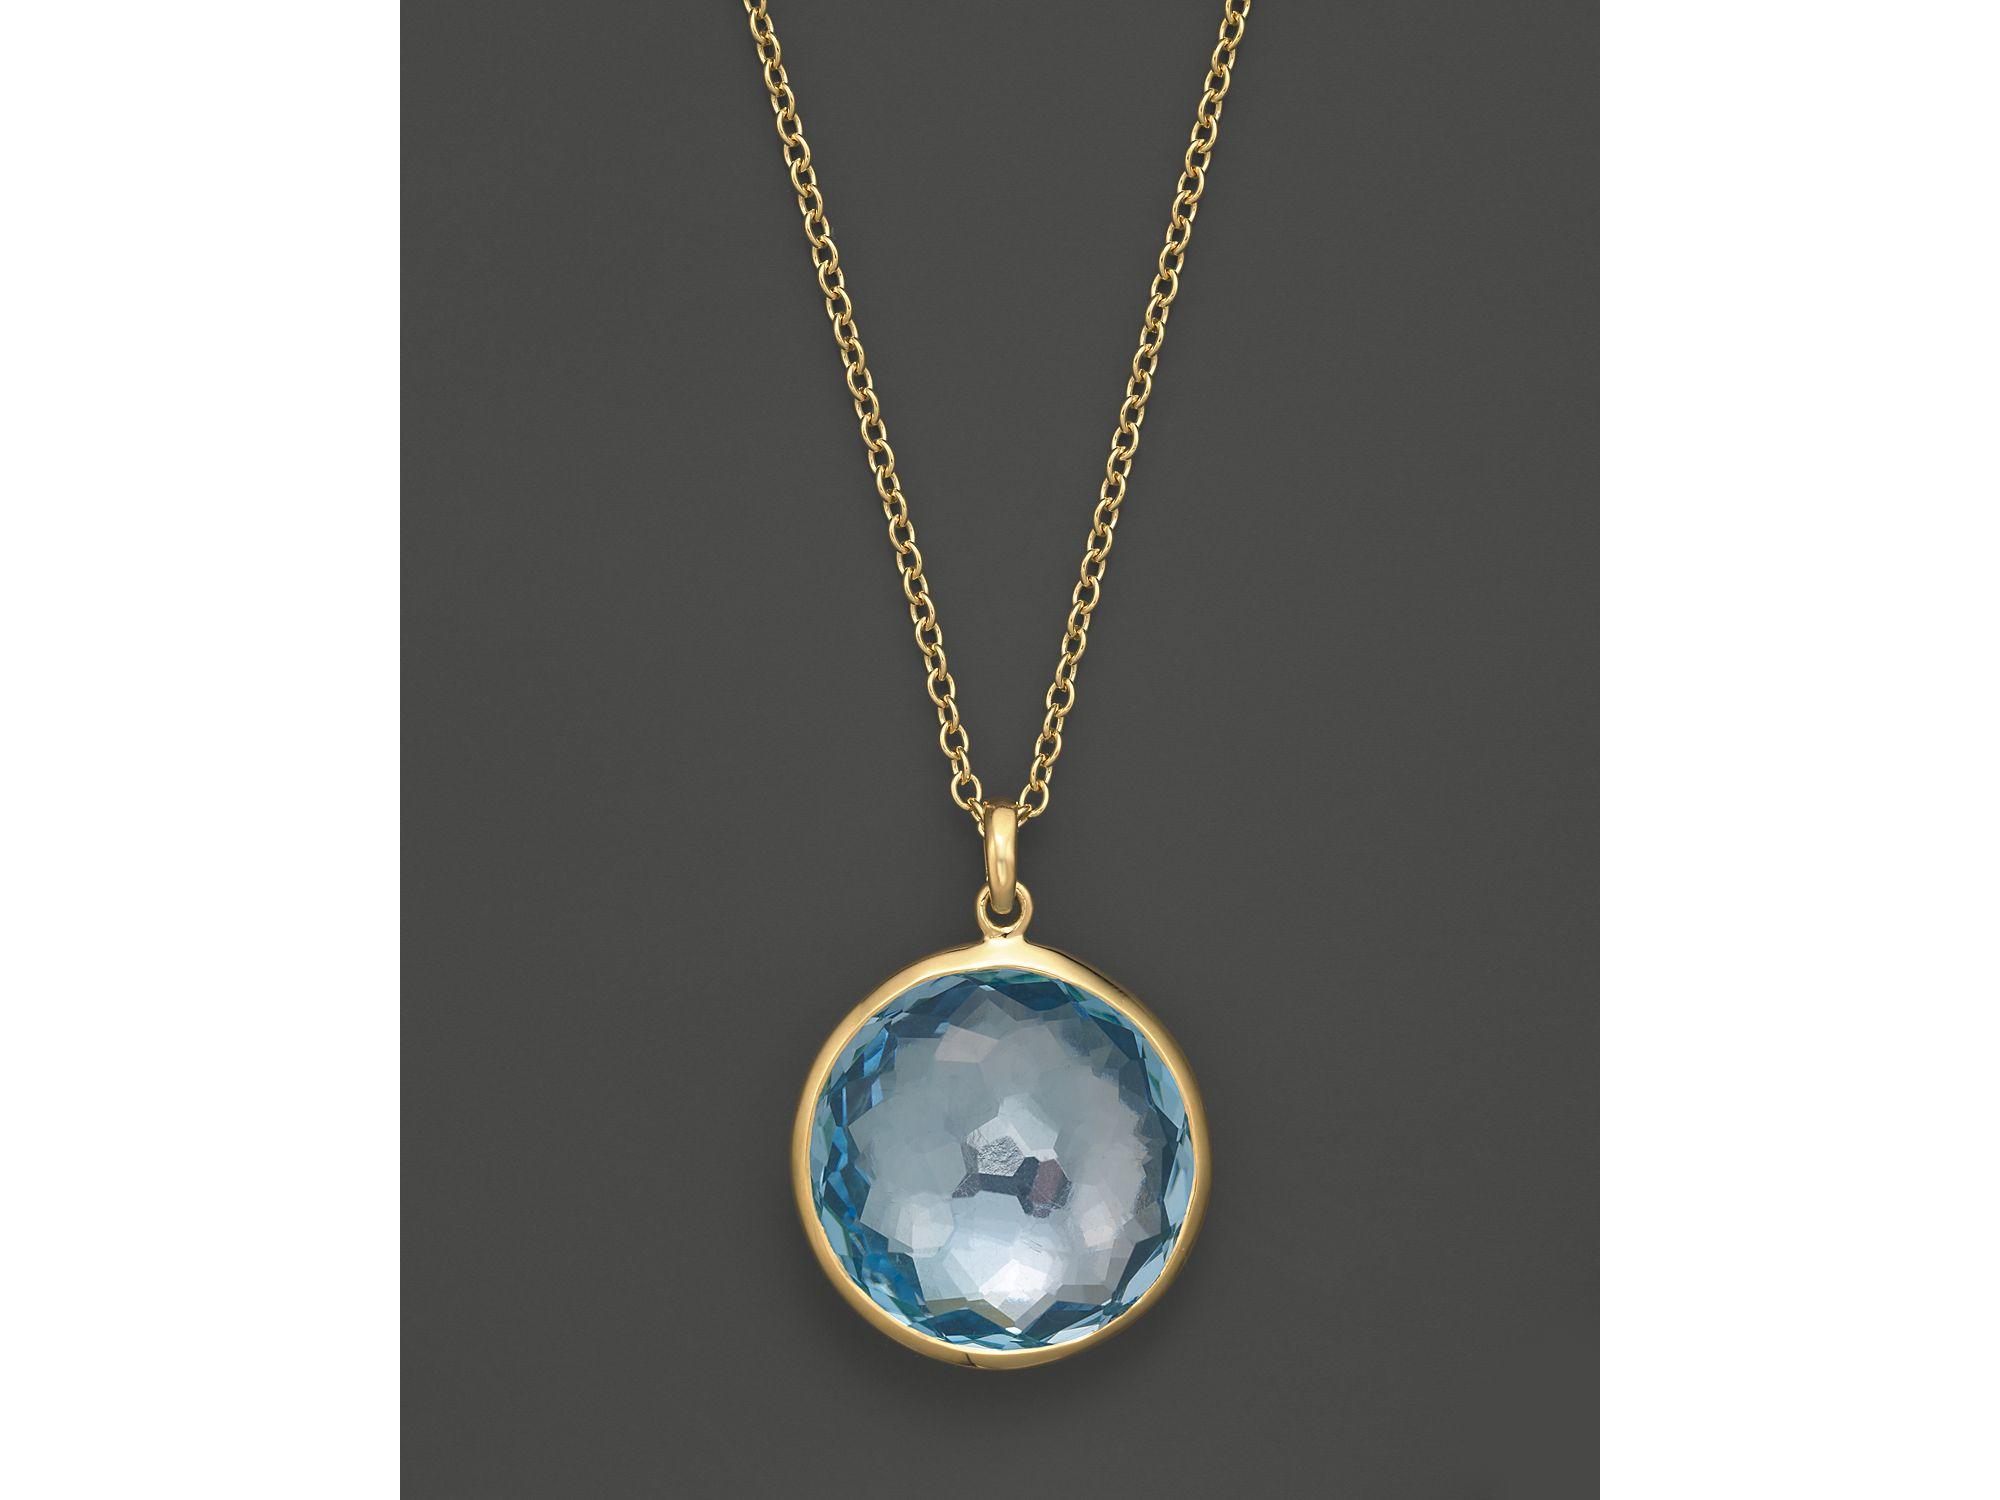 Lyst Ippolita 18k Yellow Gold Lollipop Pendant Necklace